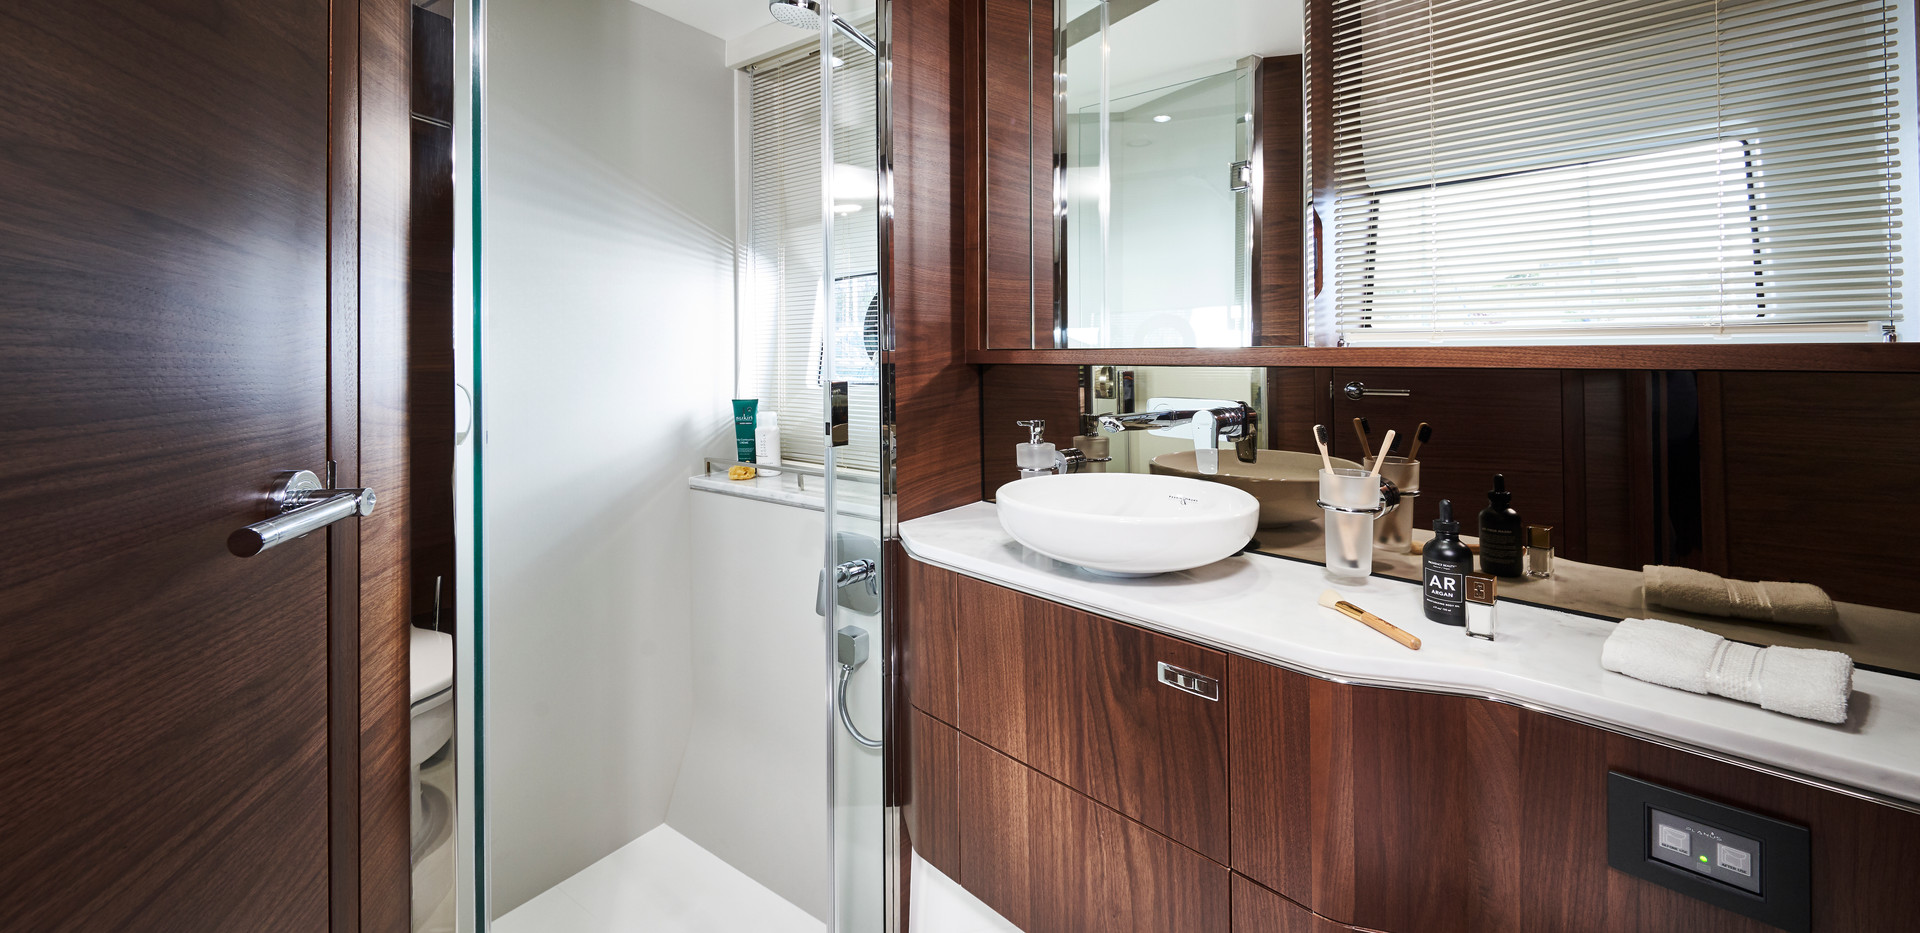 s62-interior-forward-cabin-bathroom-waln